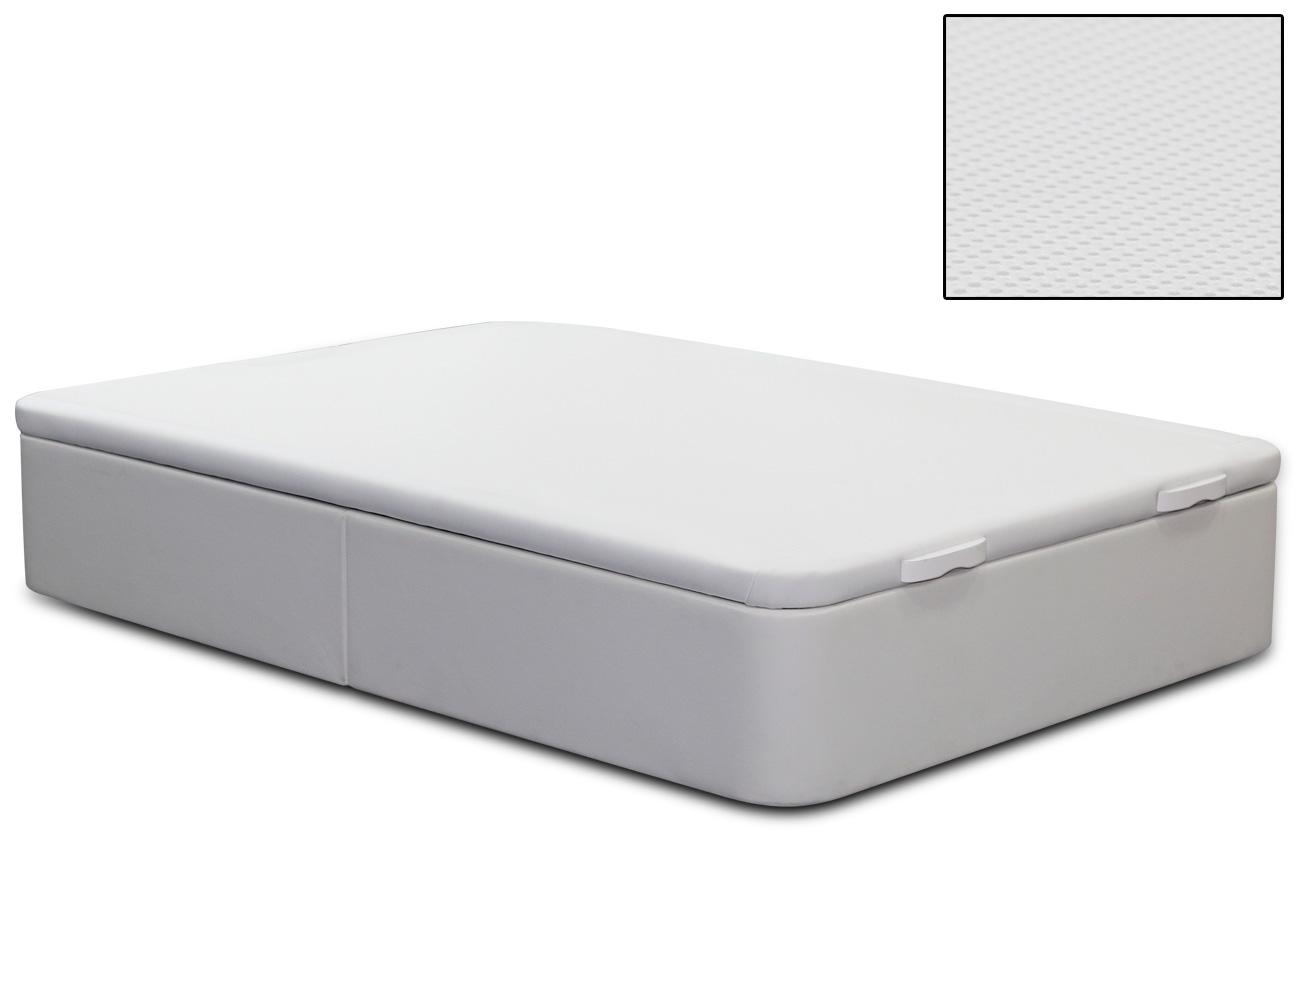 Canape polipiel blanco hercules tapa 3d9